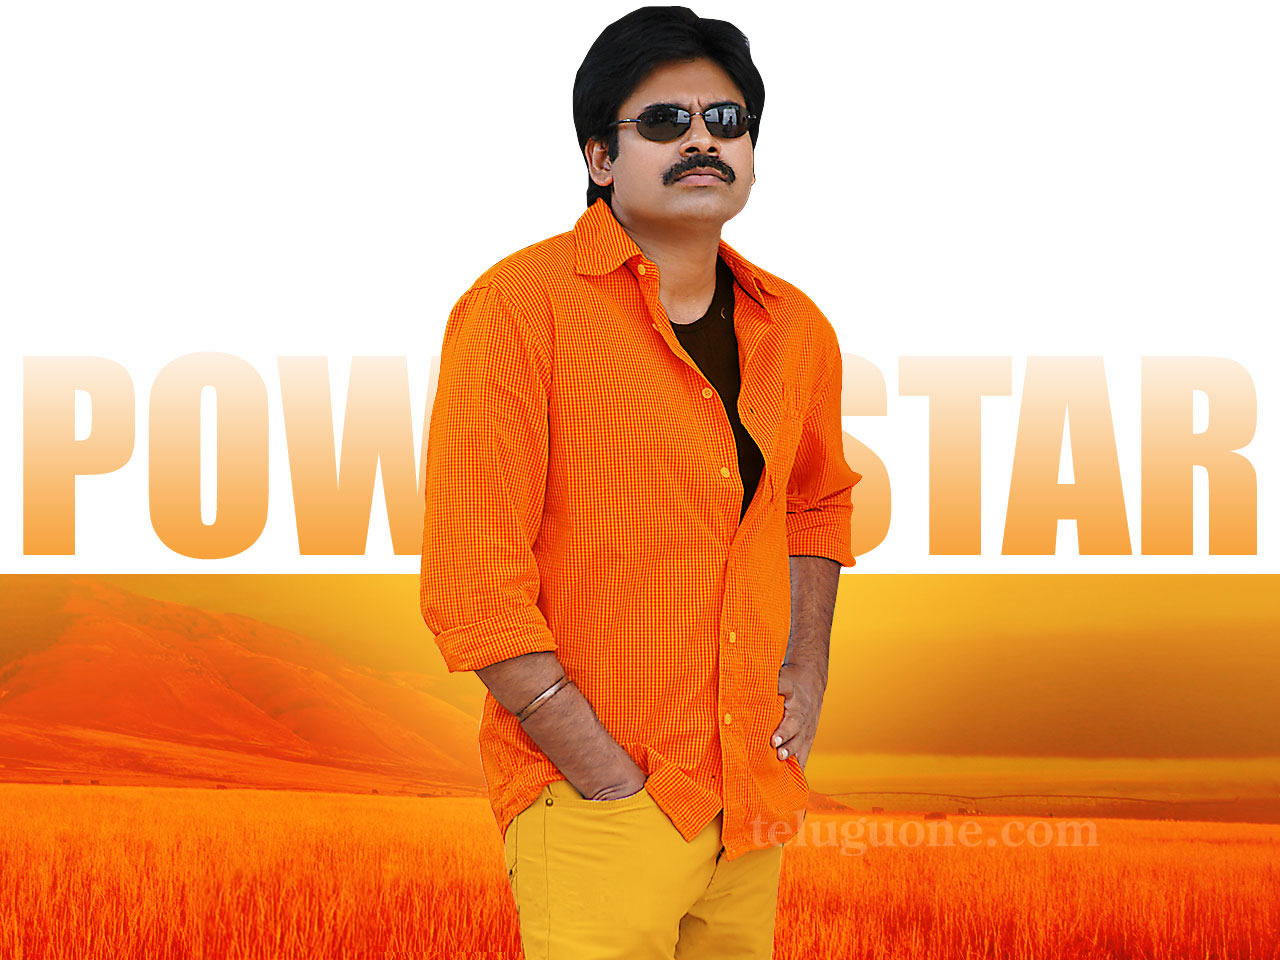 pawan kalyan images photos latest hd wallpapers free download pawan kalyan images photos latest hd